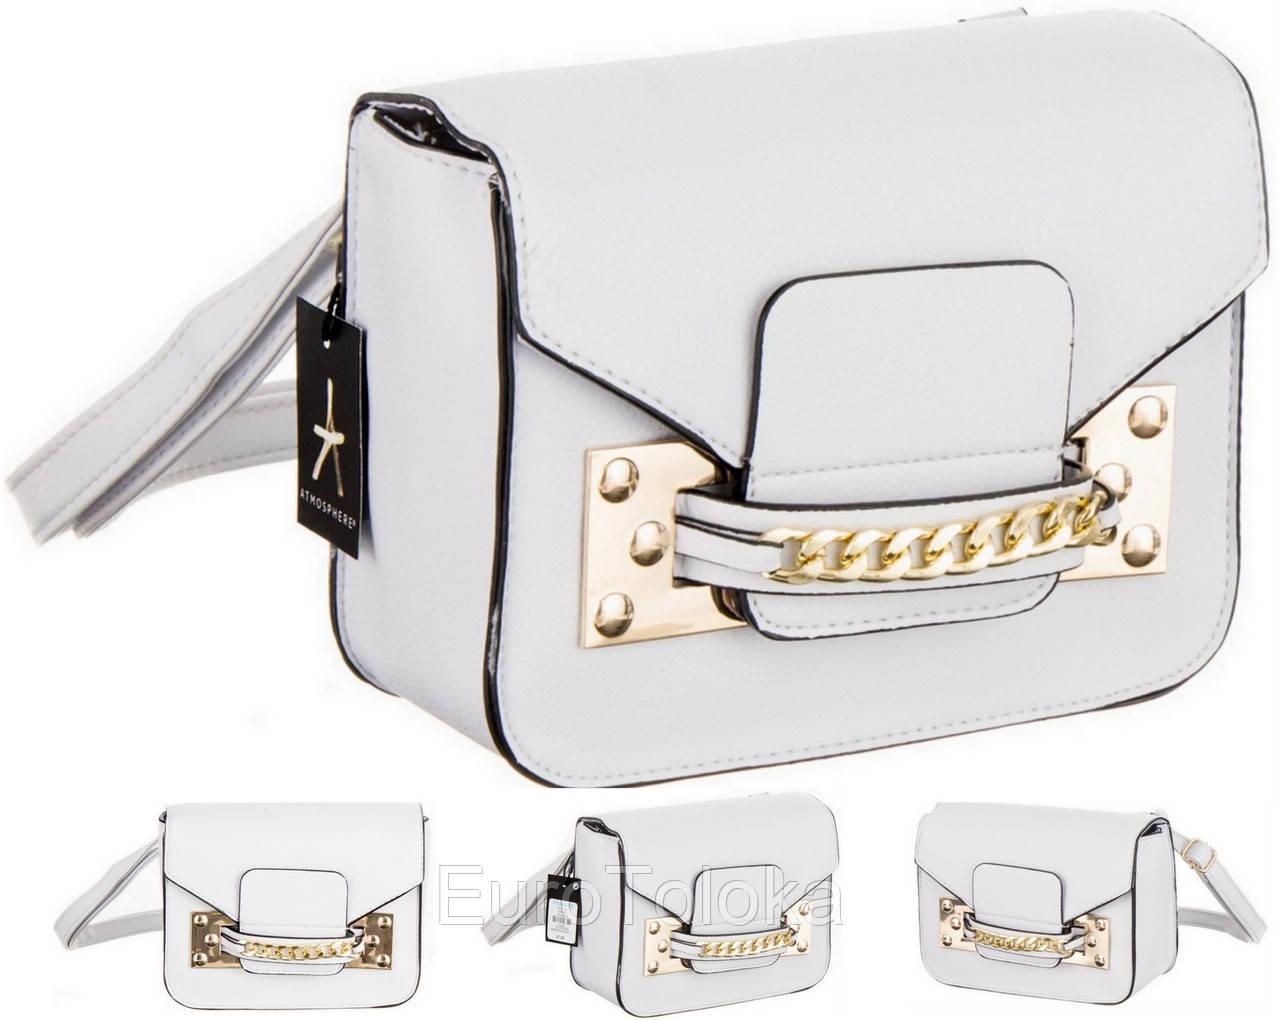 d9ae92bb5539 Красивая женская сумка почтальонка - сумка через плечо Primark S atmosphere